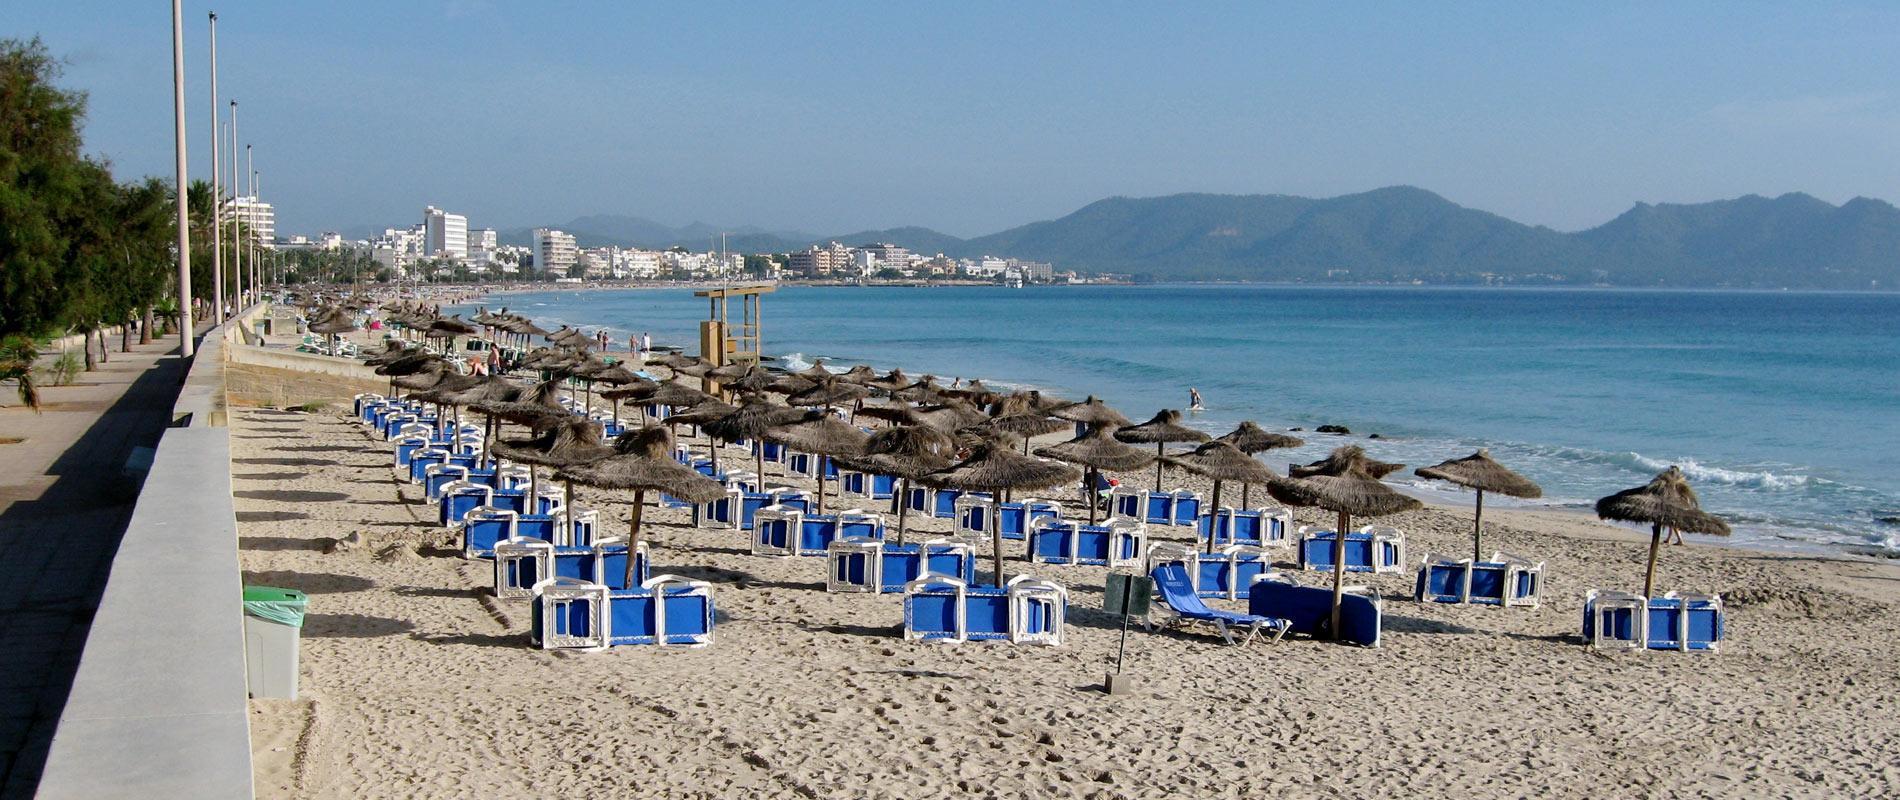 Talayot Hotel Cala Millor Mallorca